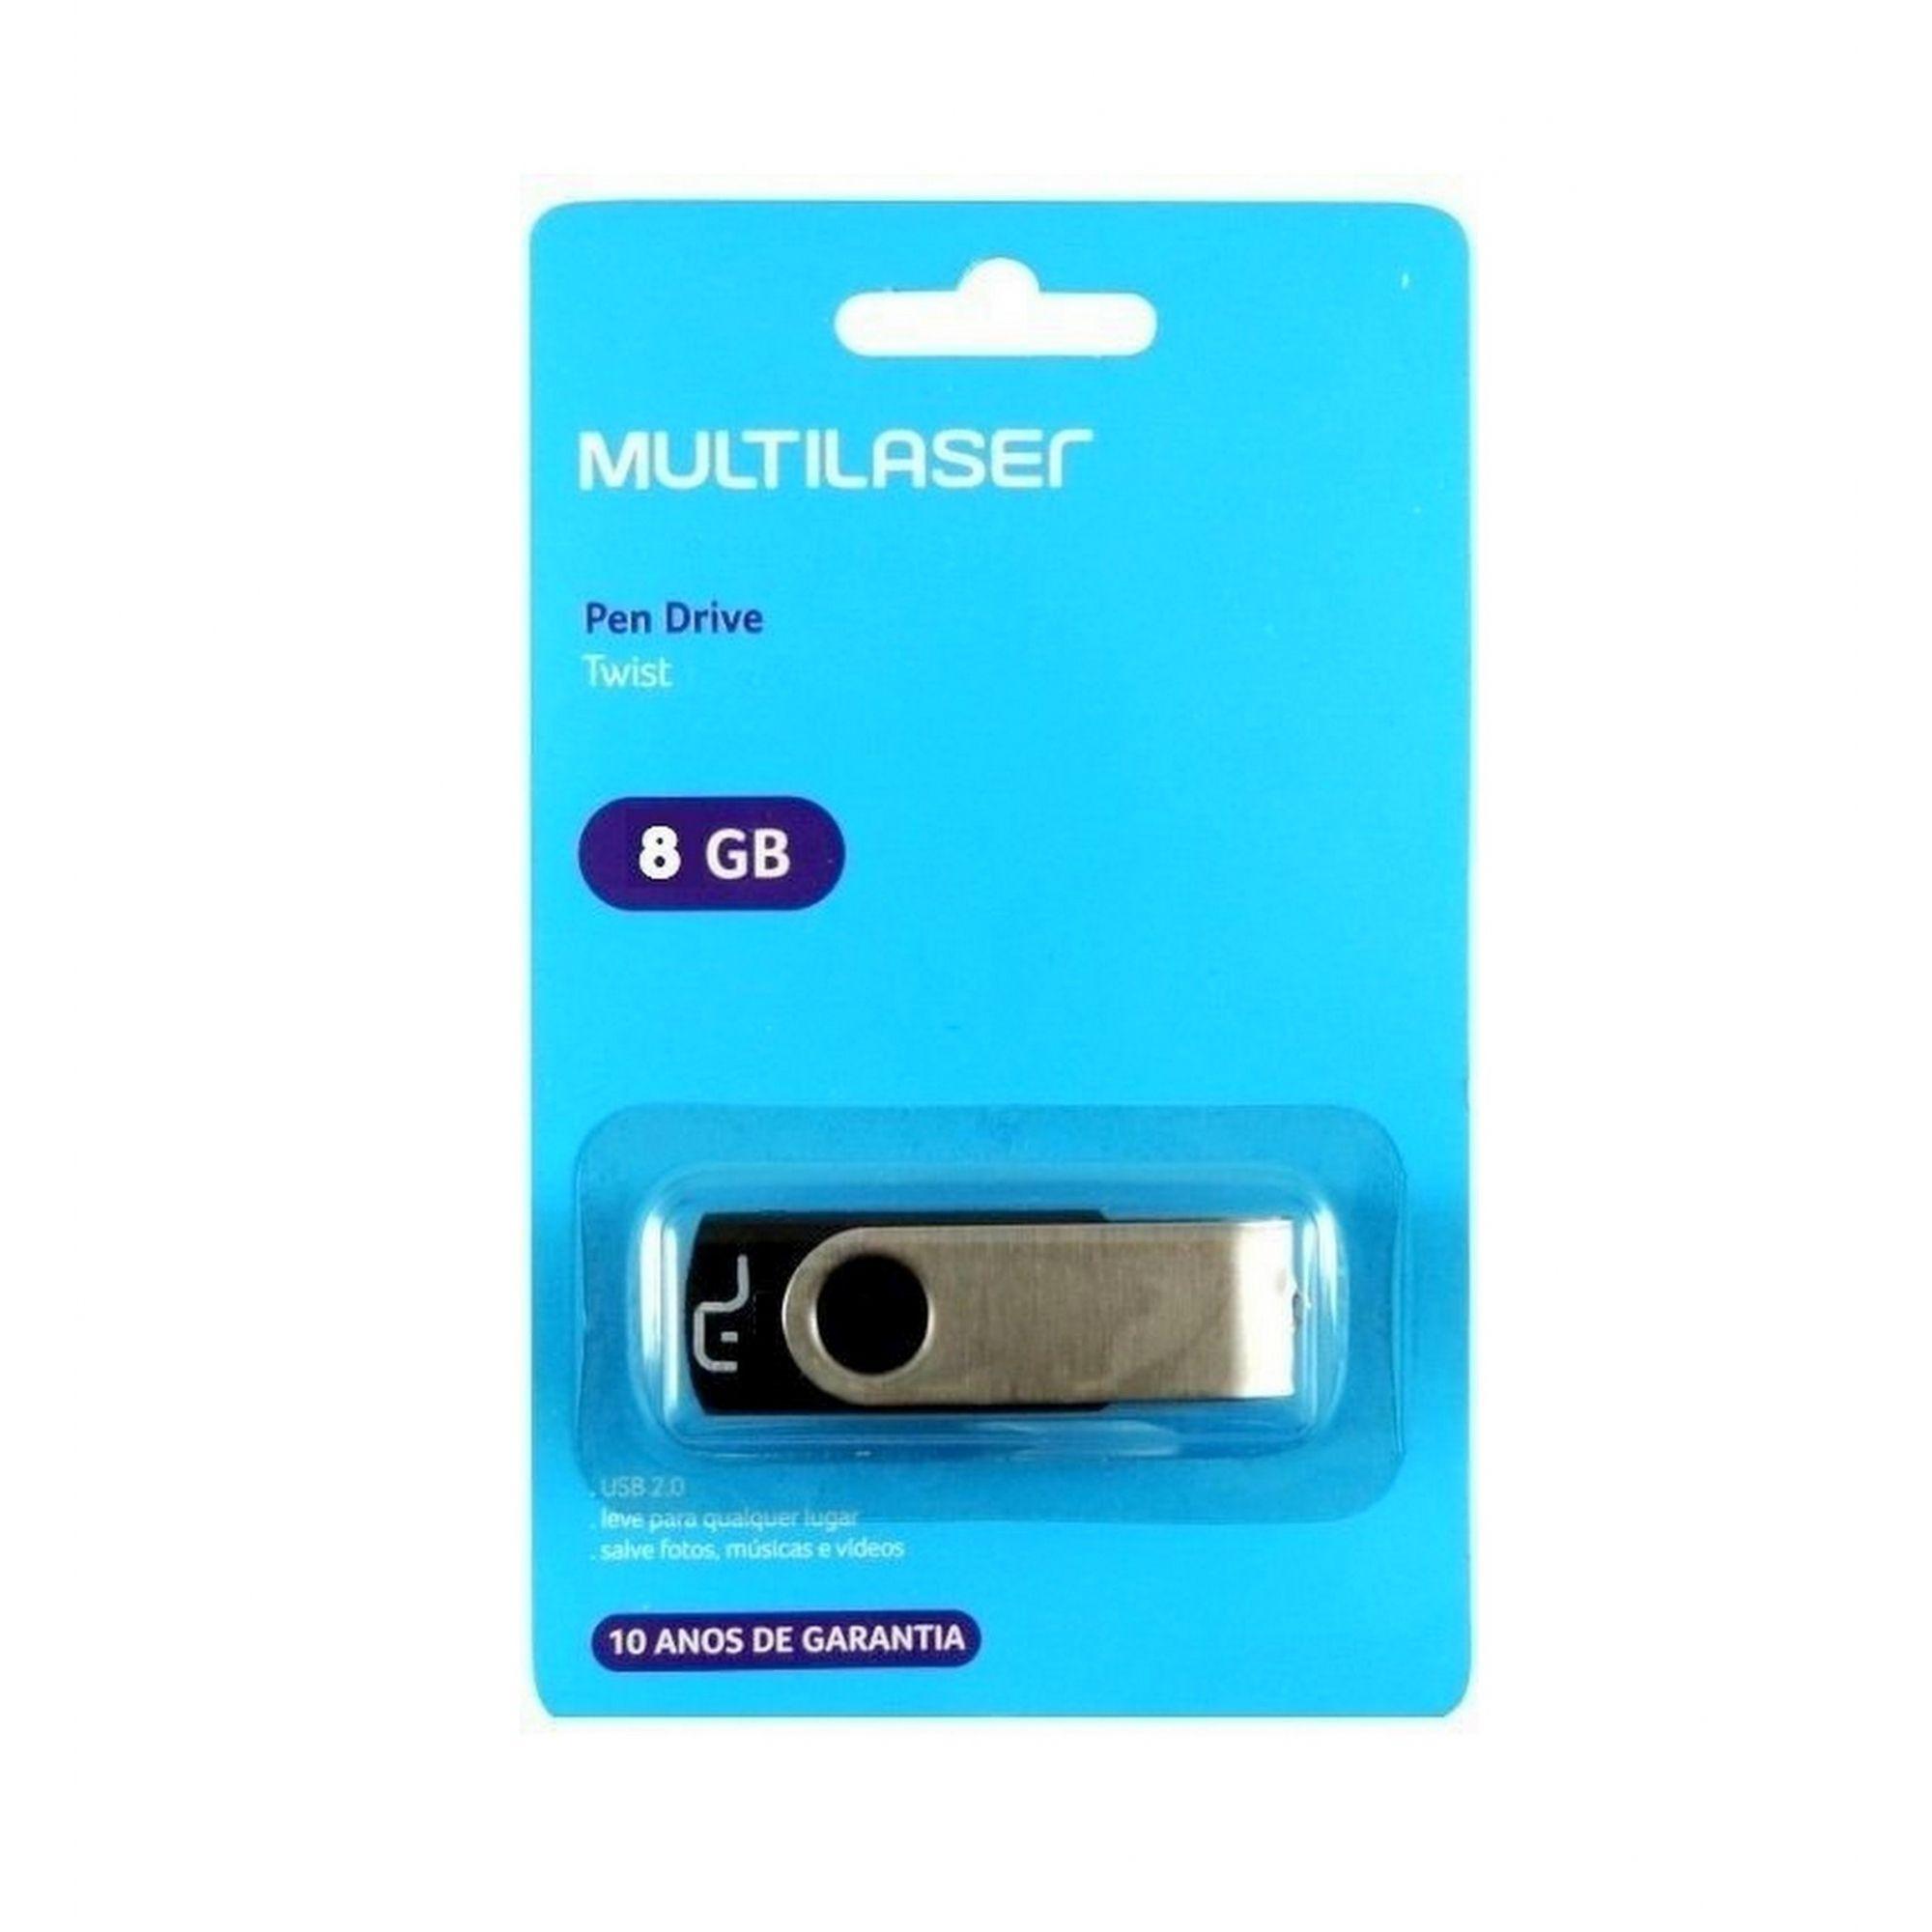 PENDRIVE TWIST PD587 8GB MULTILASER